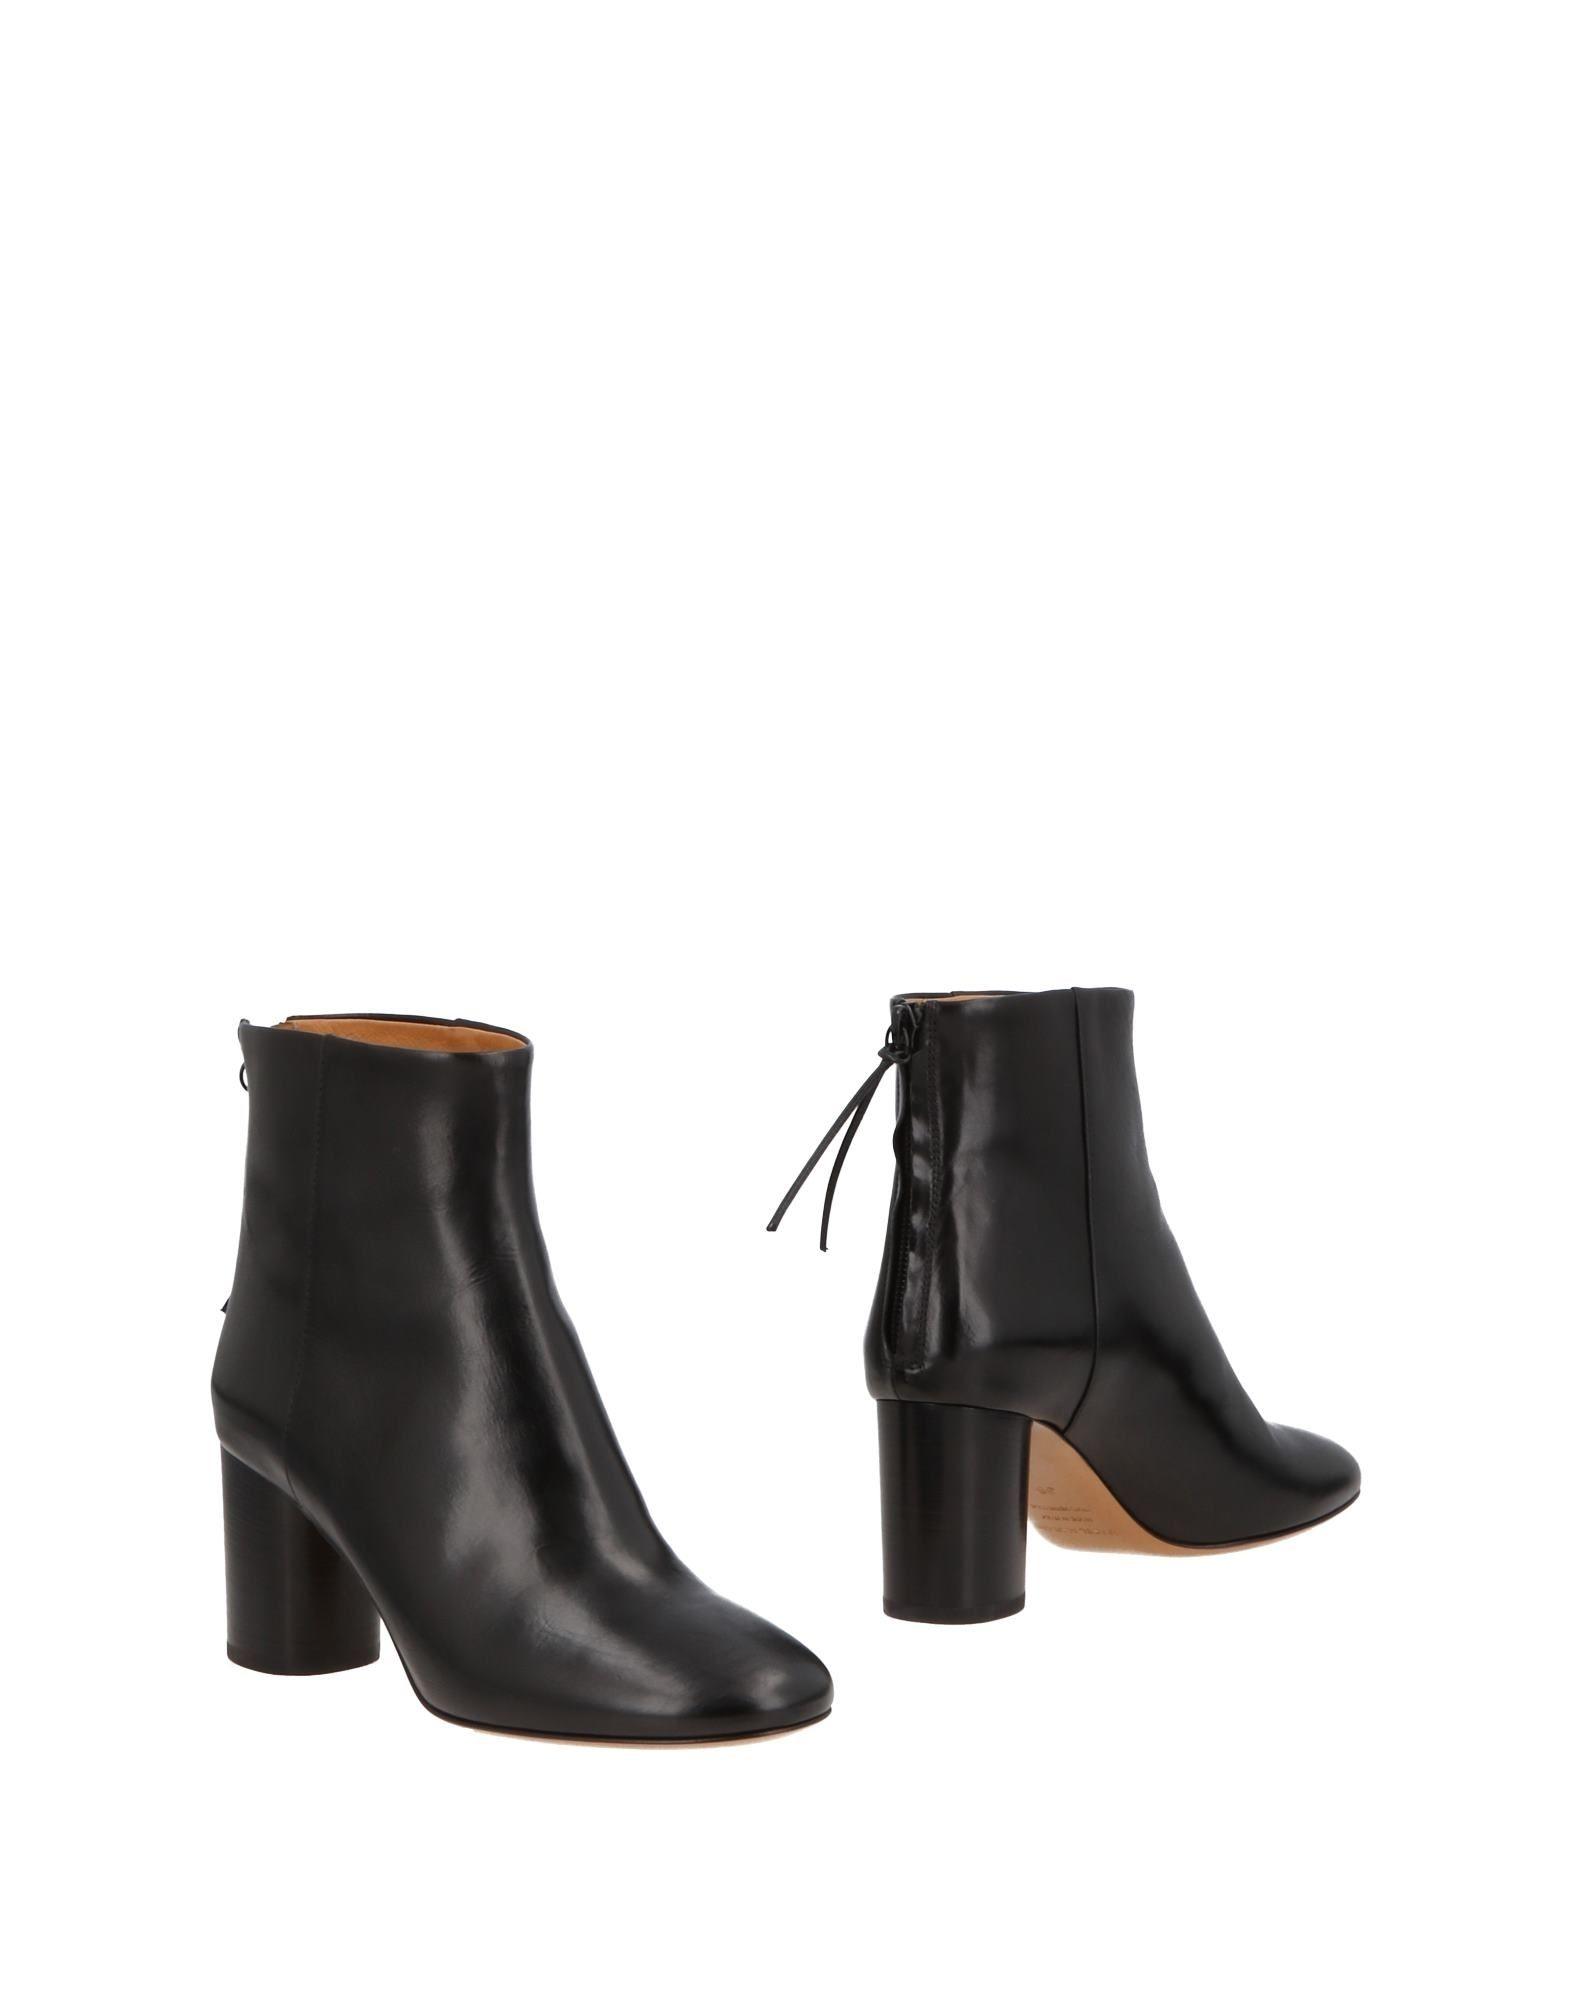 Isabel Marant Stiefelette Damen  11500537LP Beliebte Schuhe